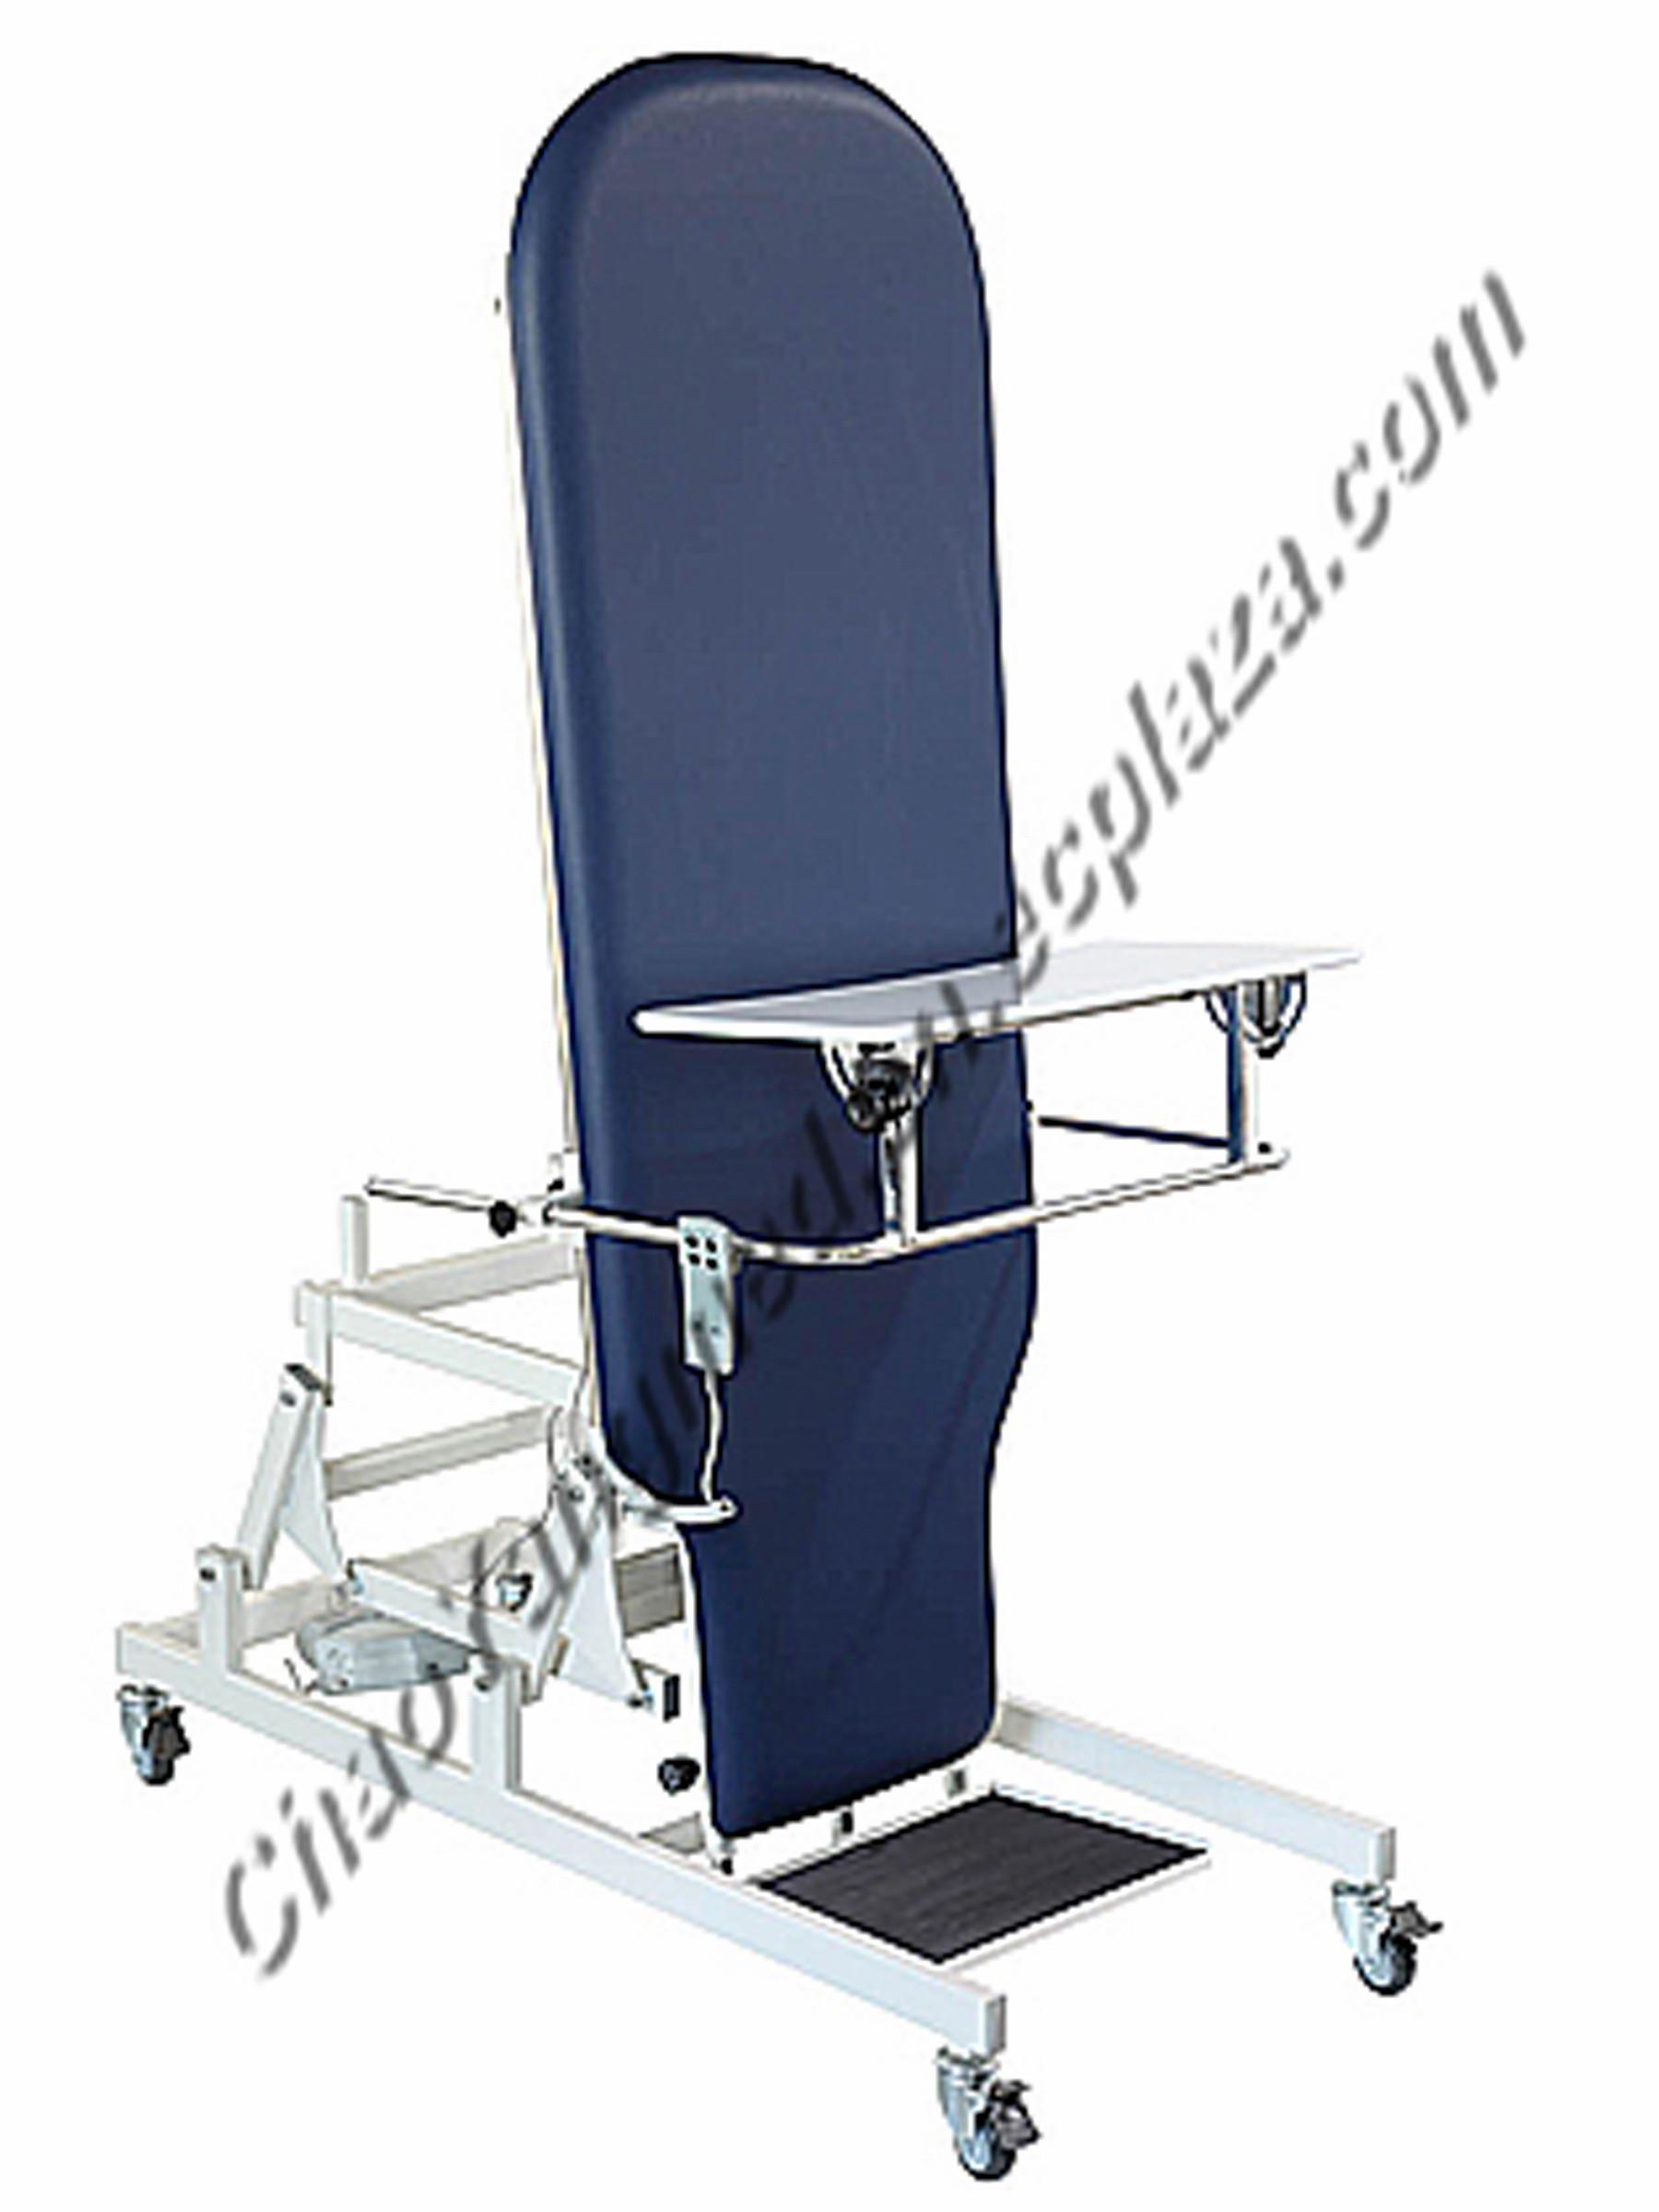 Electric medical tilt table CY-C109